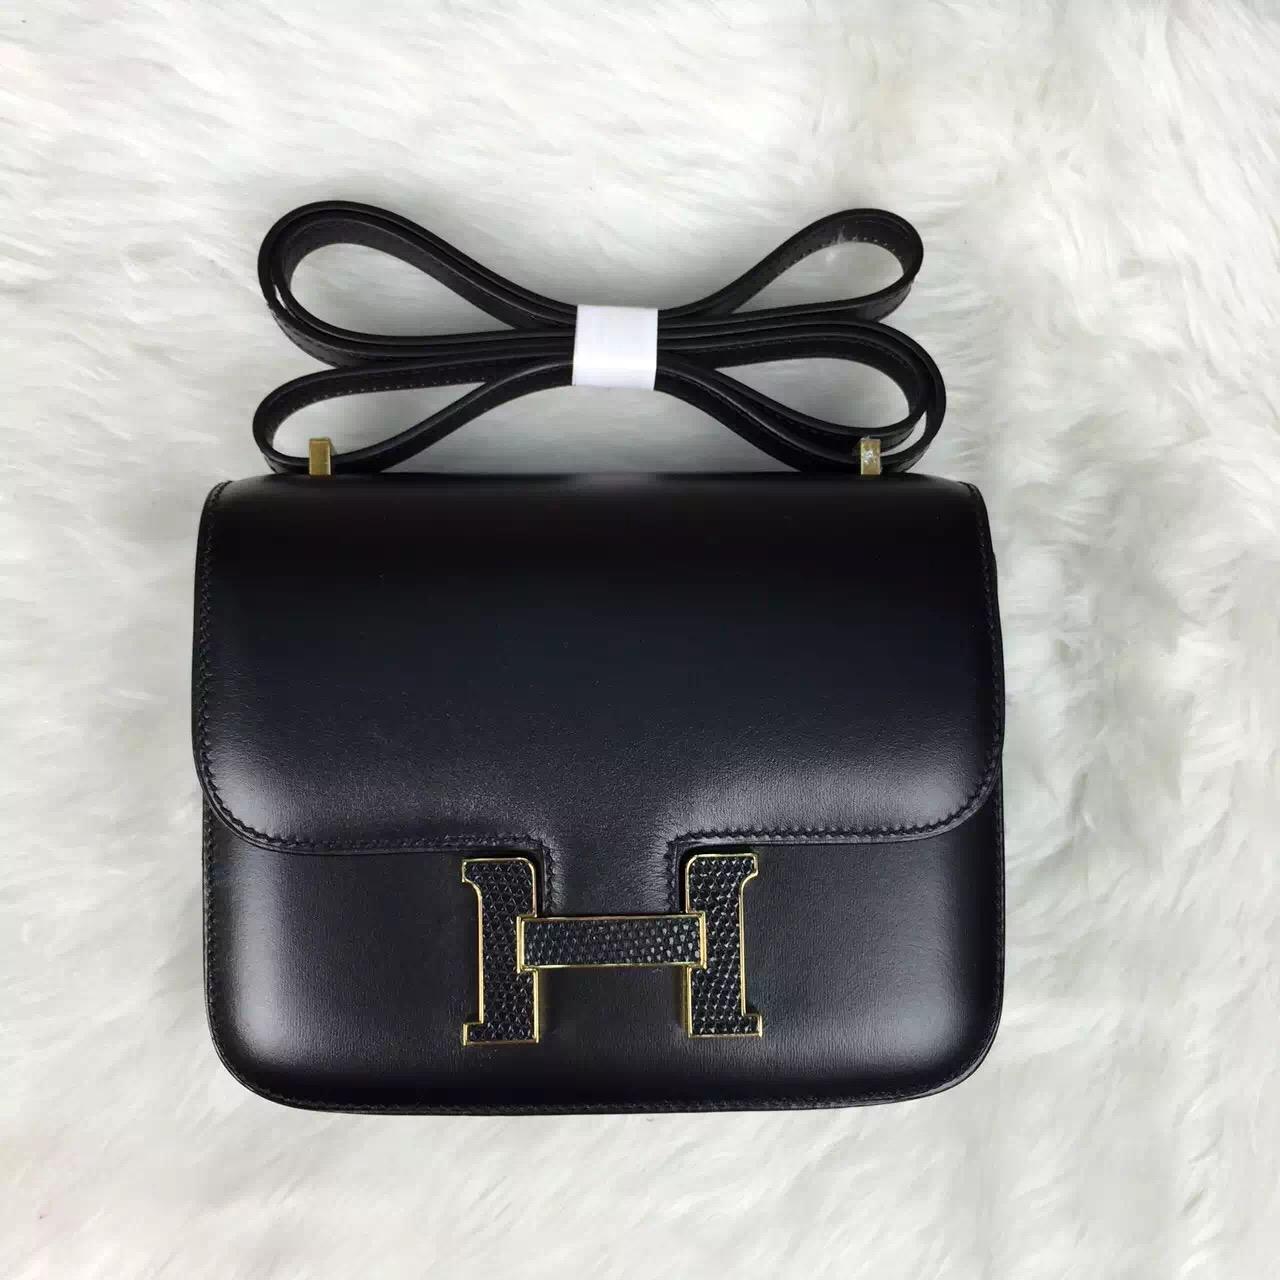 Hand Stitching Hermes Black Box Calfskin Leather Constance Bag Cross-body Bag Lizard Buckle